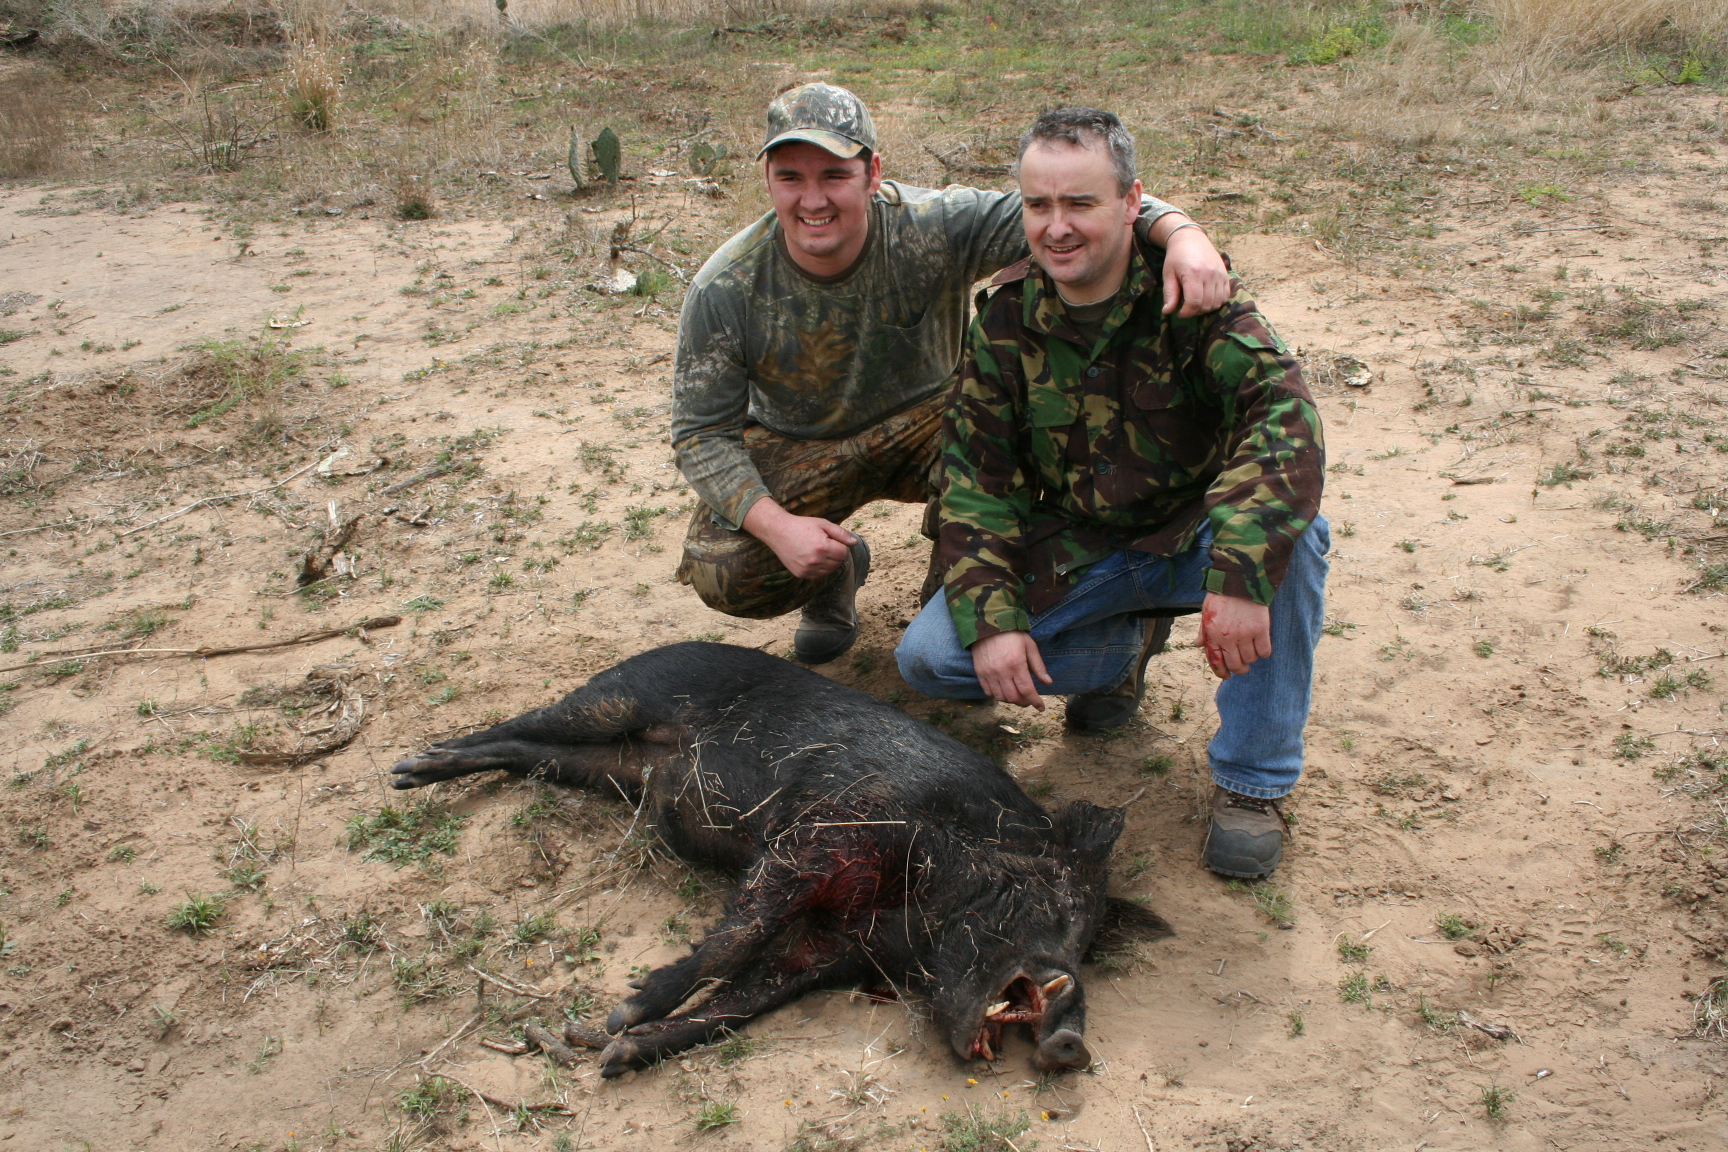 Hog hunt 3-9-08 085.jpg